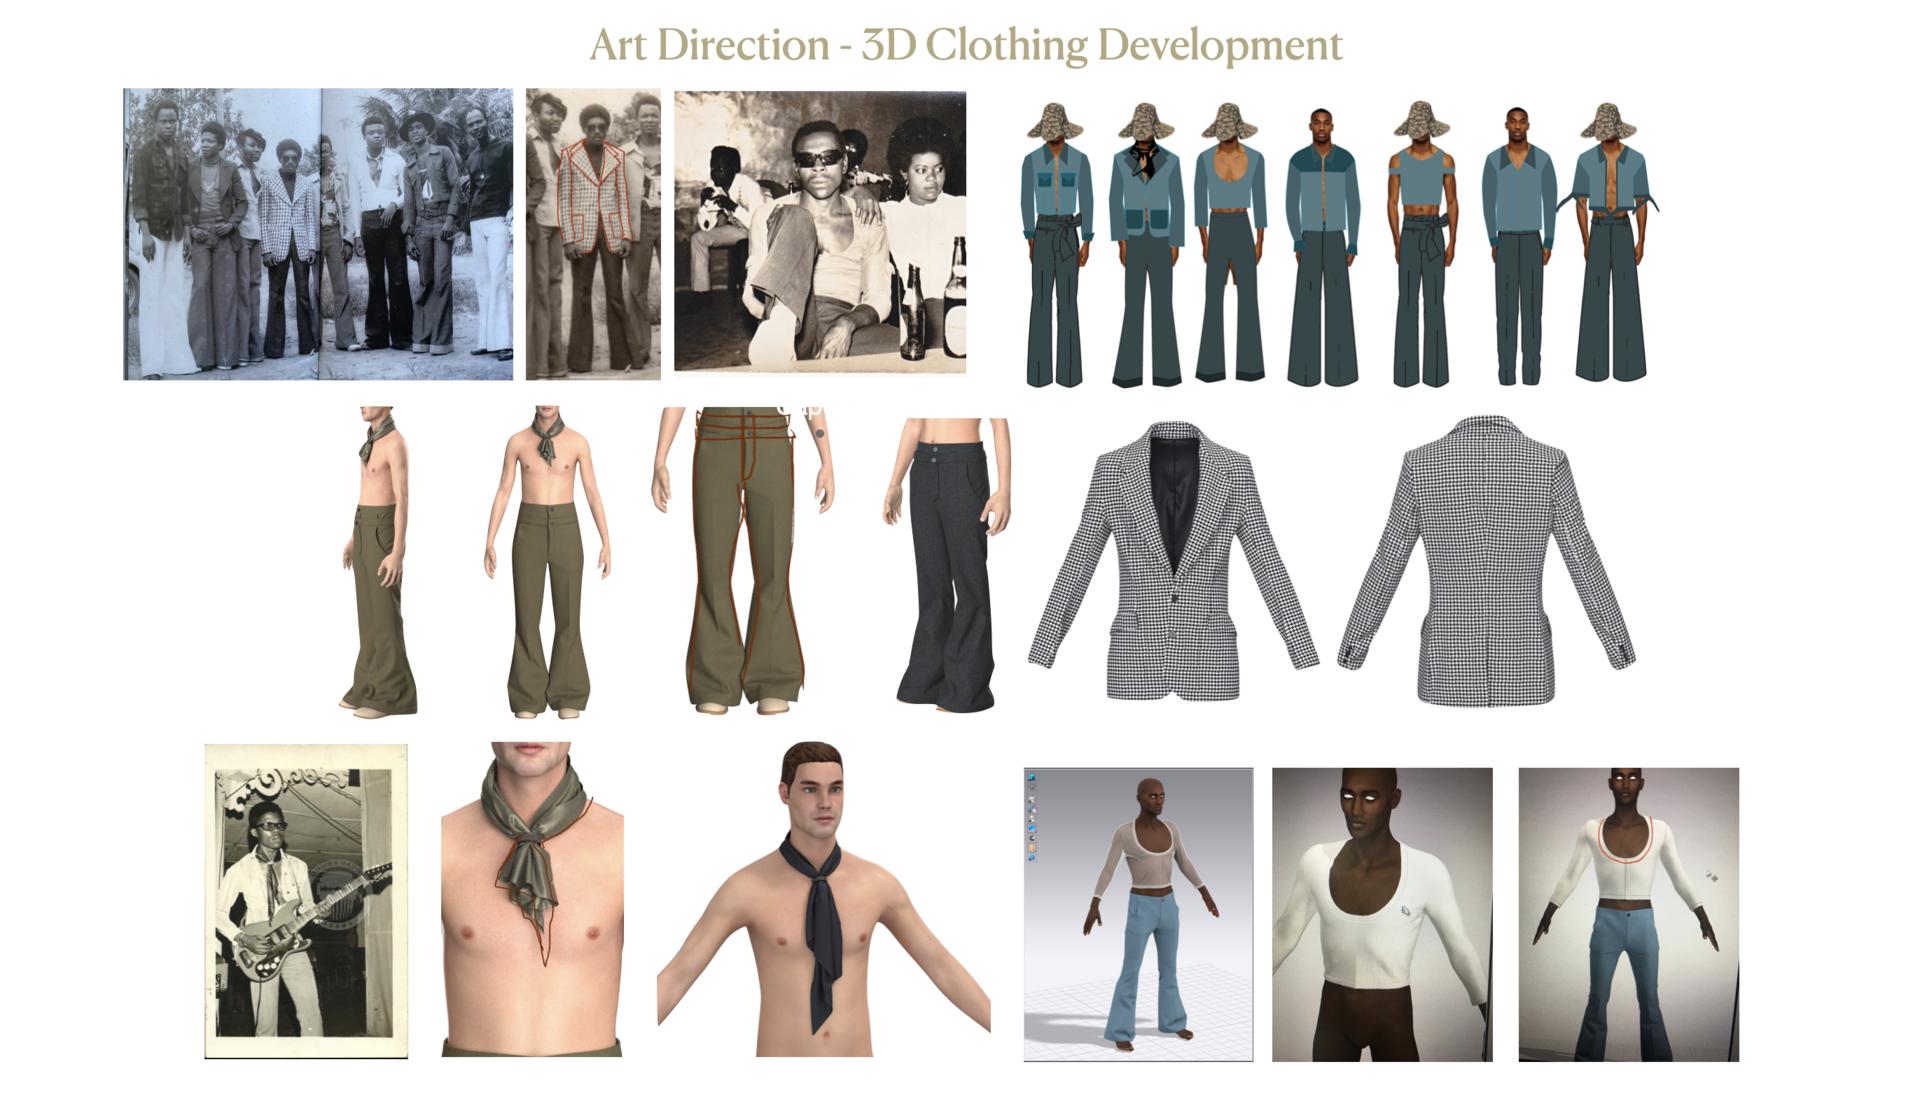 3D Clothing Design Process